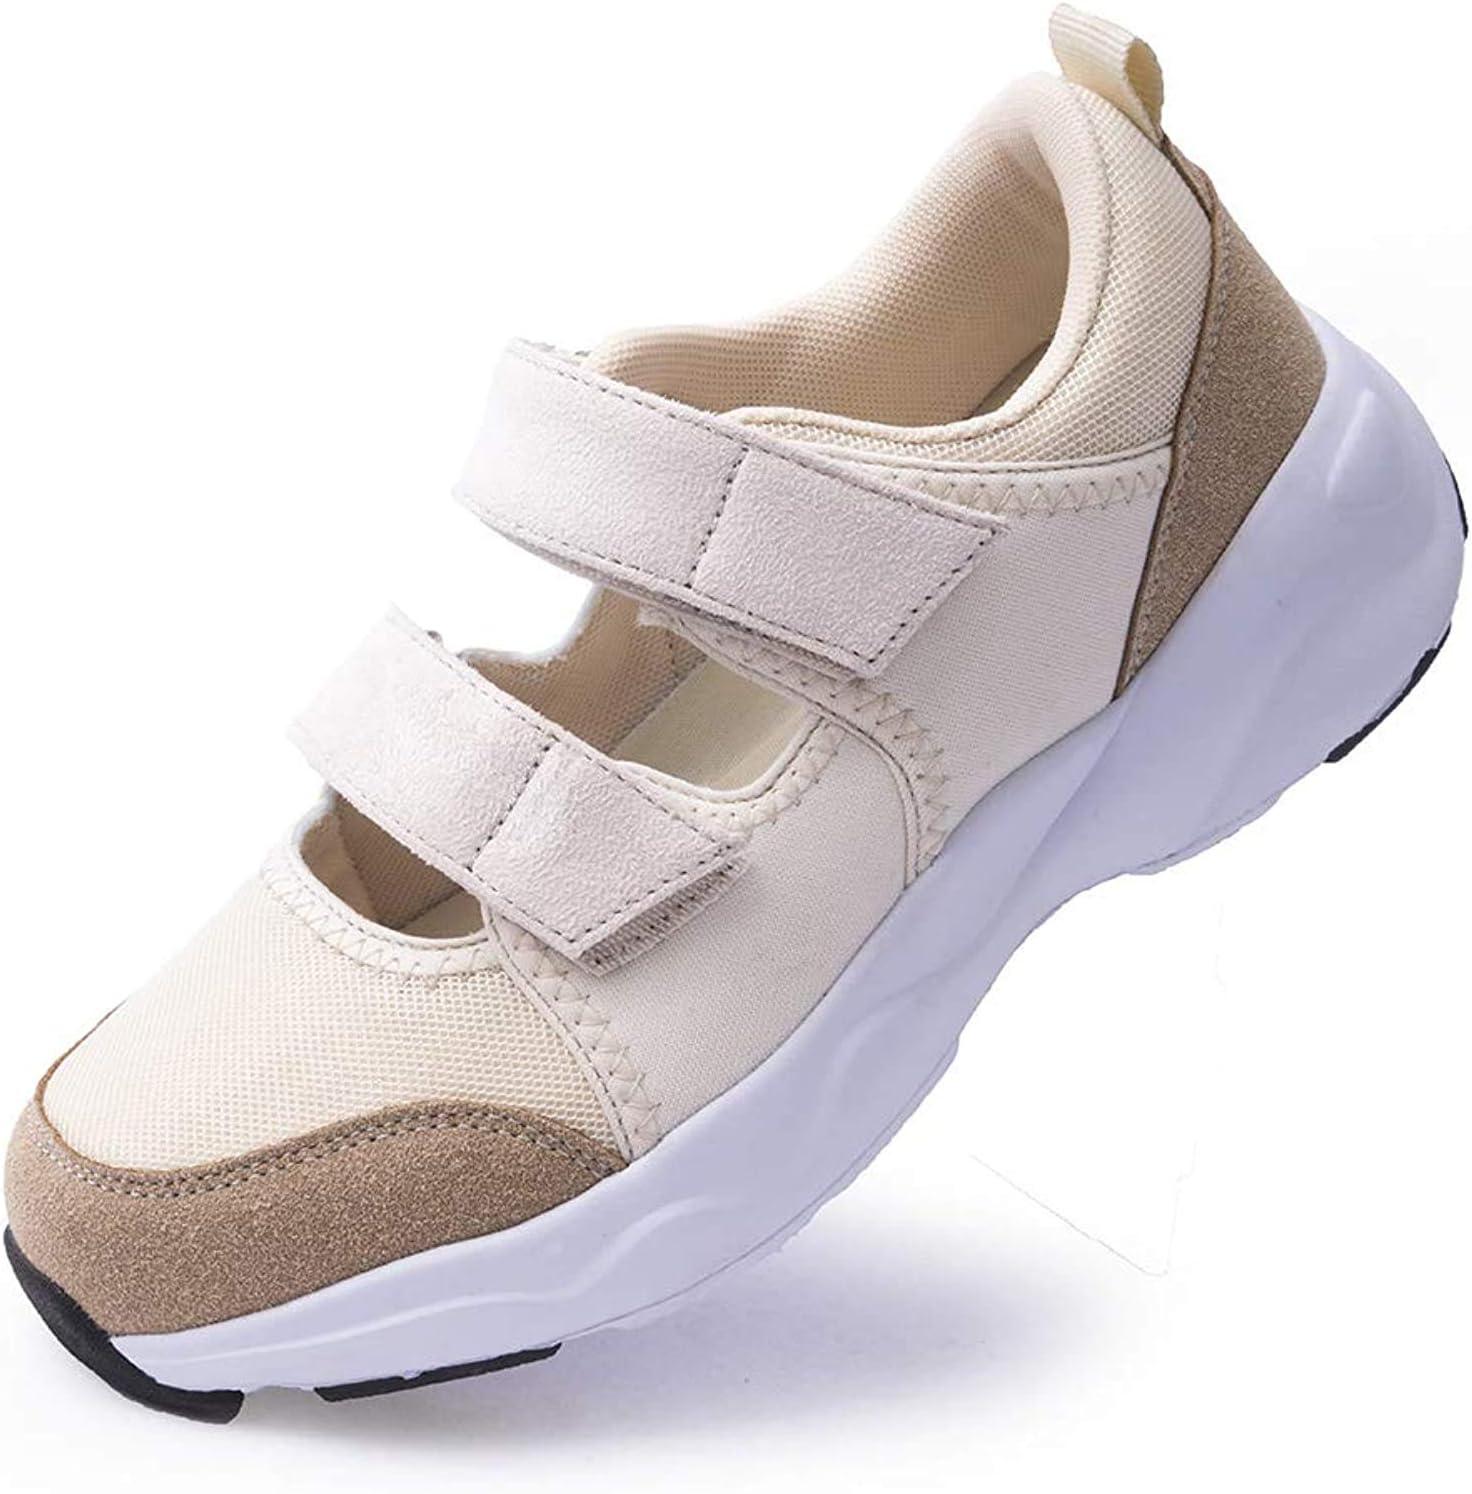 womens work shoes plantar fasciitis